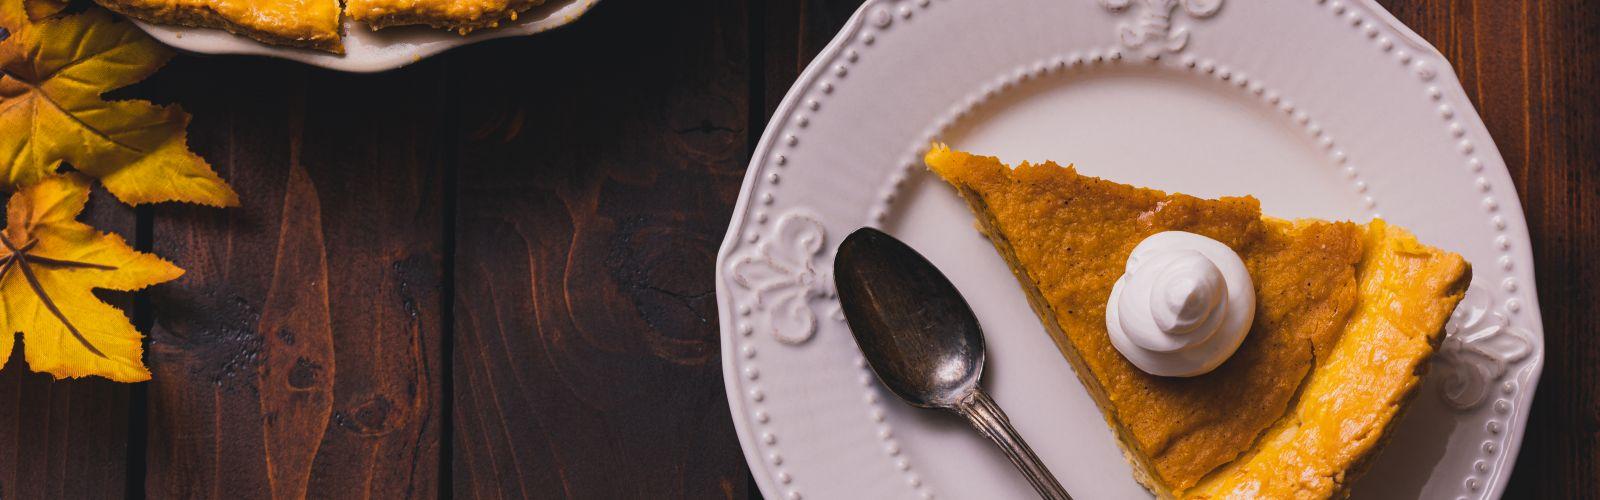 homemade pumpkin pie recipe